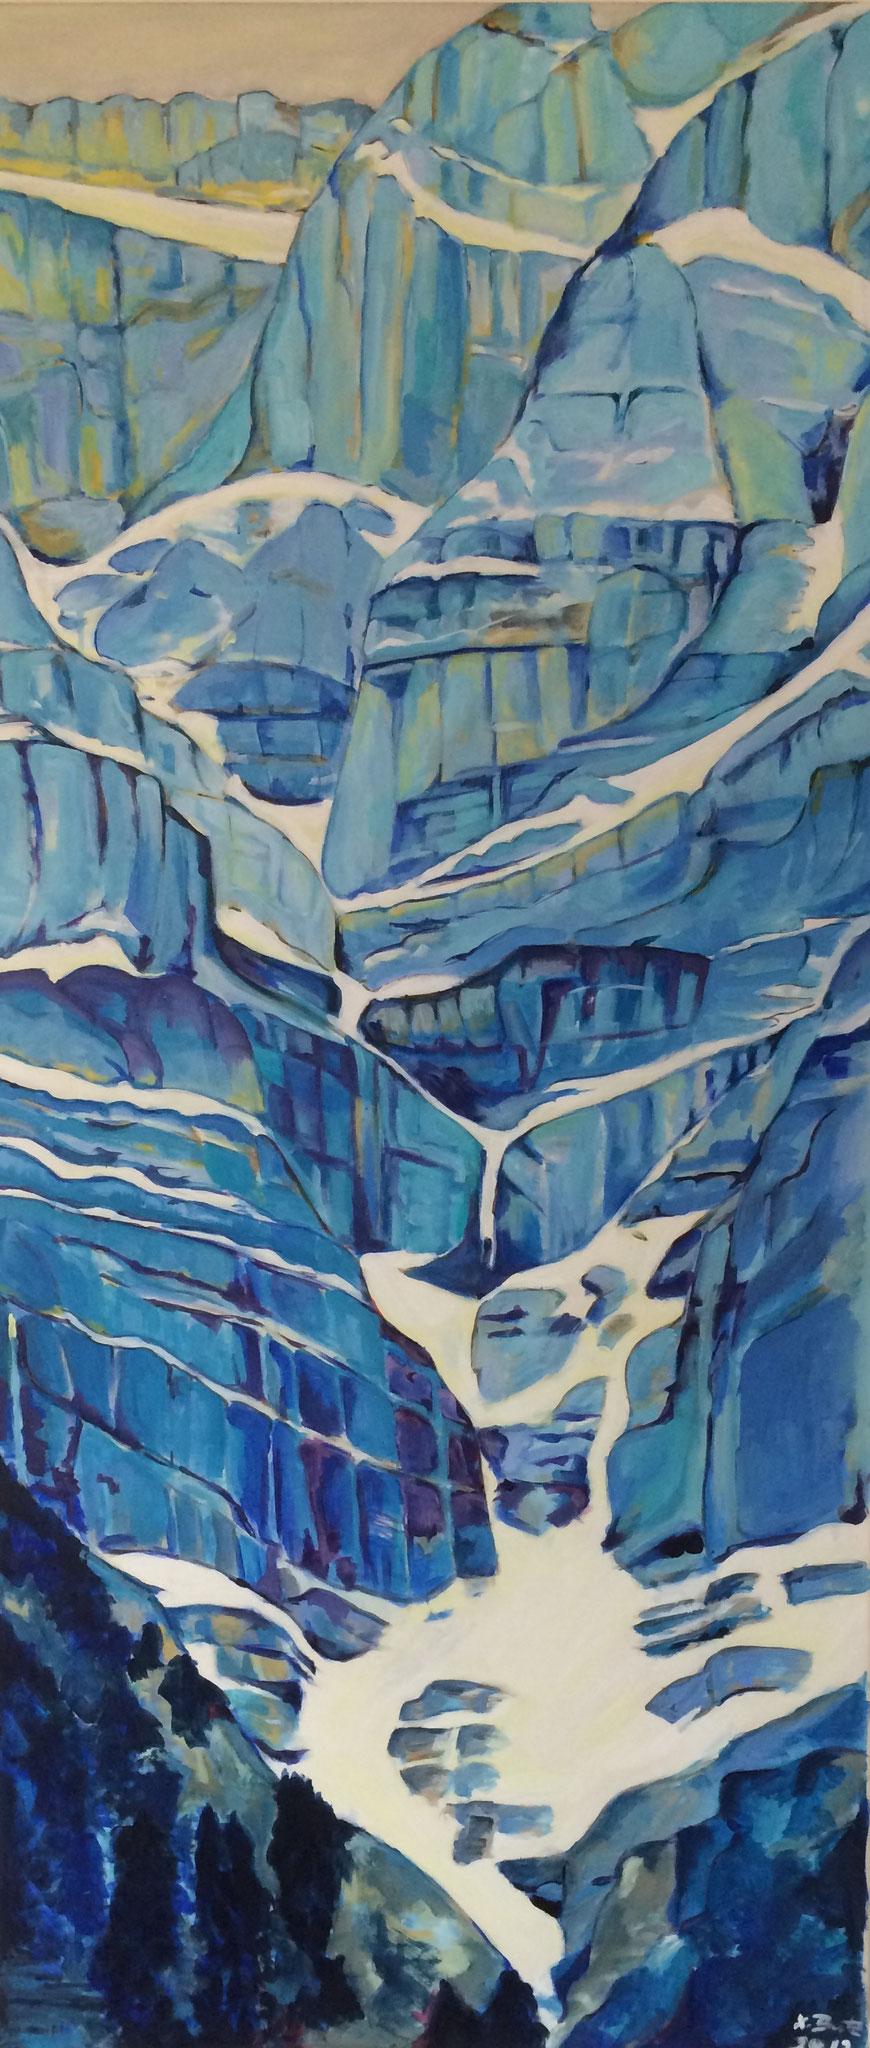 Richtung Glärnisch, 65cm x 146cm, Acryl auf Leinwand, 2012